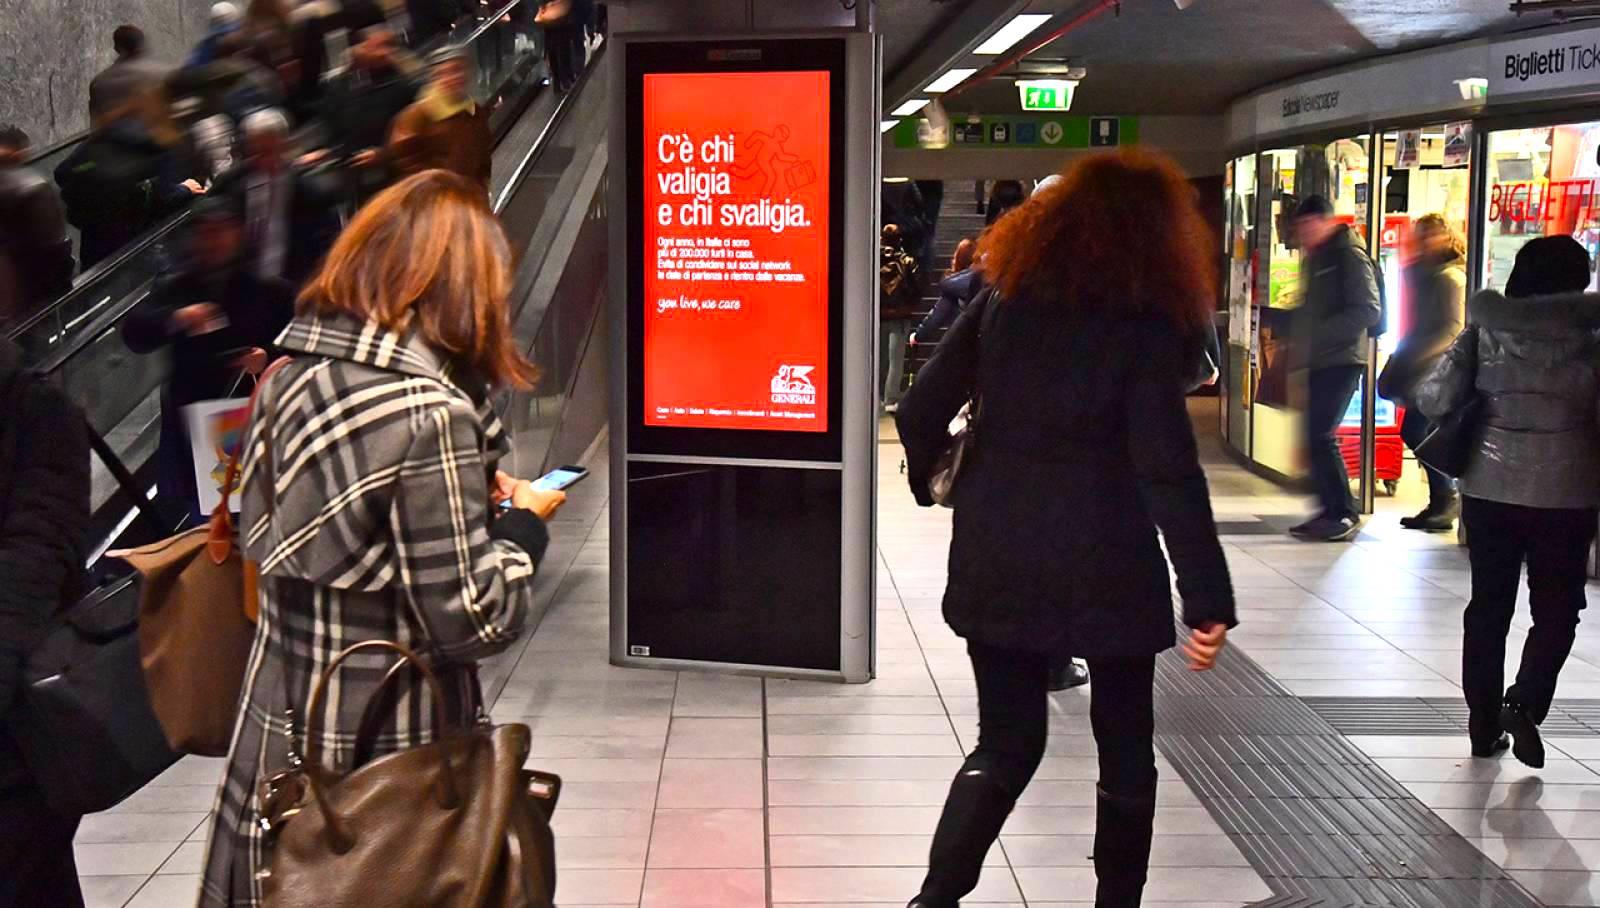 Underground advertising IGPDecaux Milan digital network for Generali